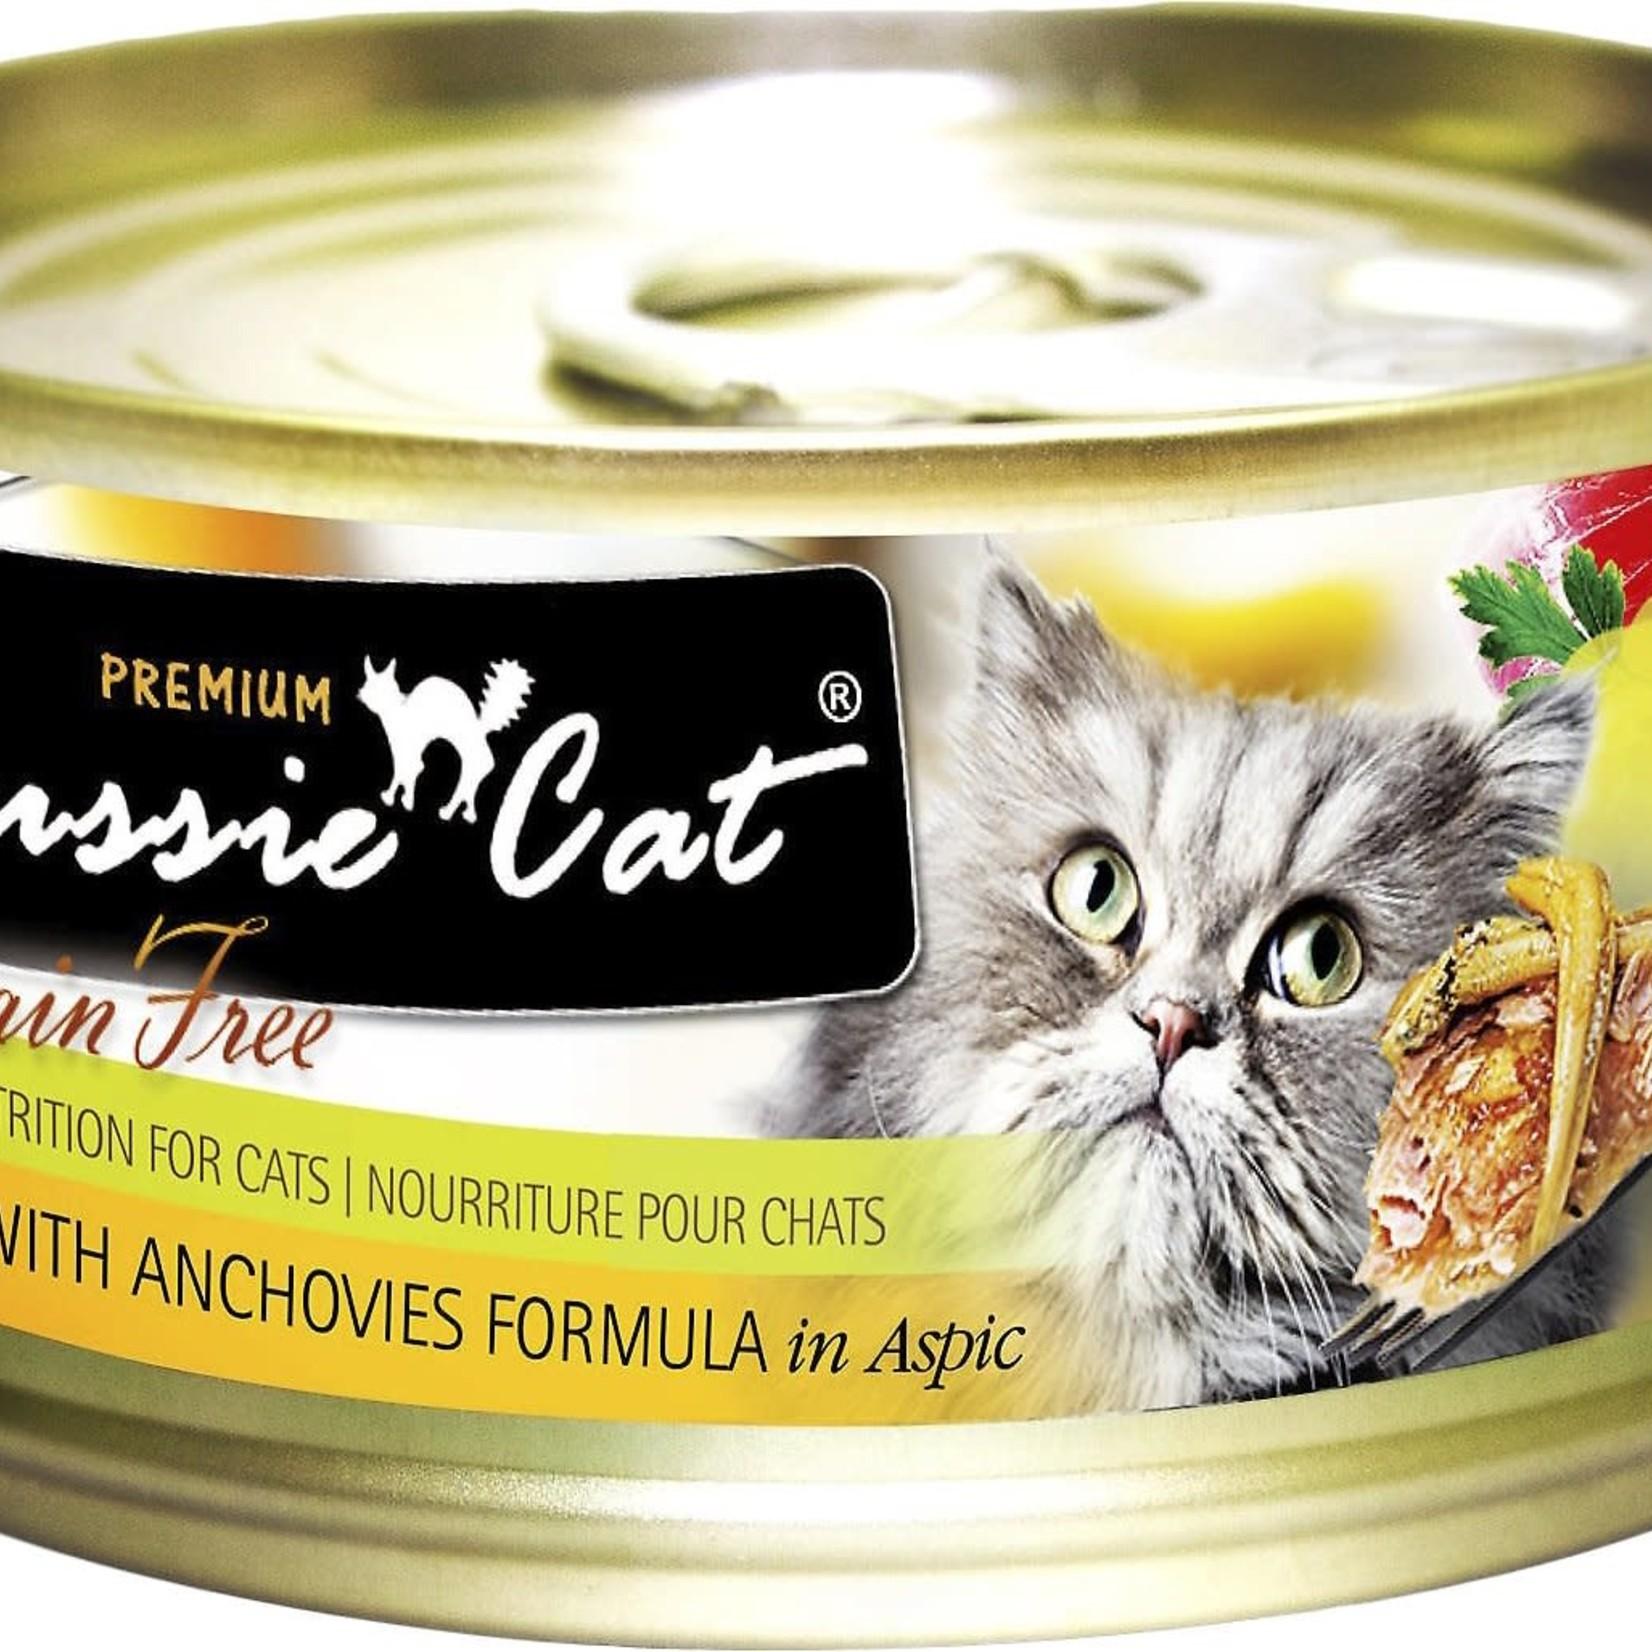 Fussie Cat Fussie Cat Tuna & Anchovies 5.5 OZ